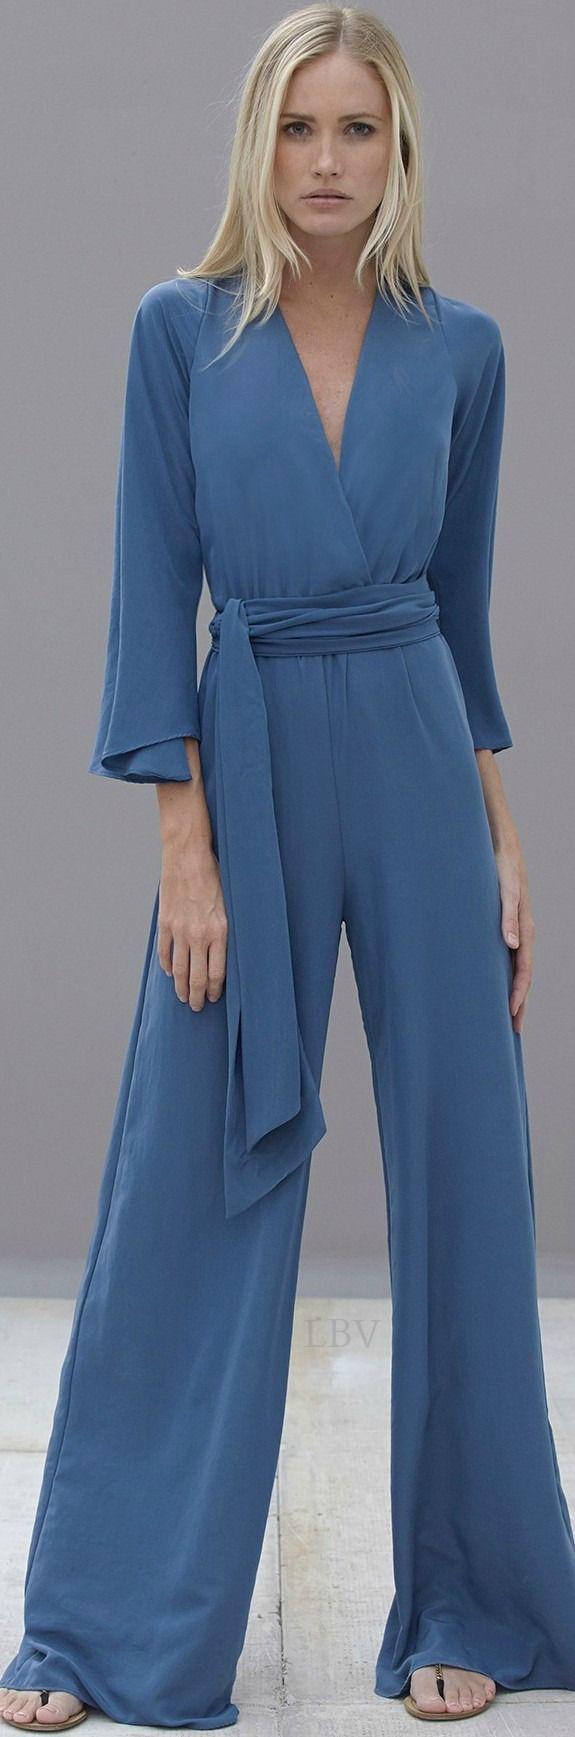 1125 Best Tulumlar Images On Pinterest Evening Gowns Sequins And The Olive House Gantungan Baju X Hangar Alexis Jumpsuit Lbv